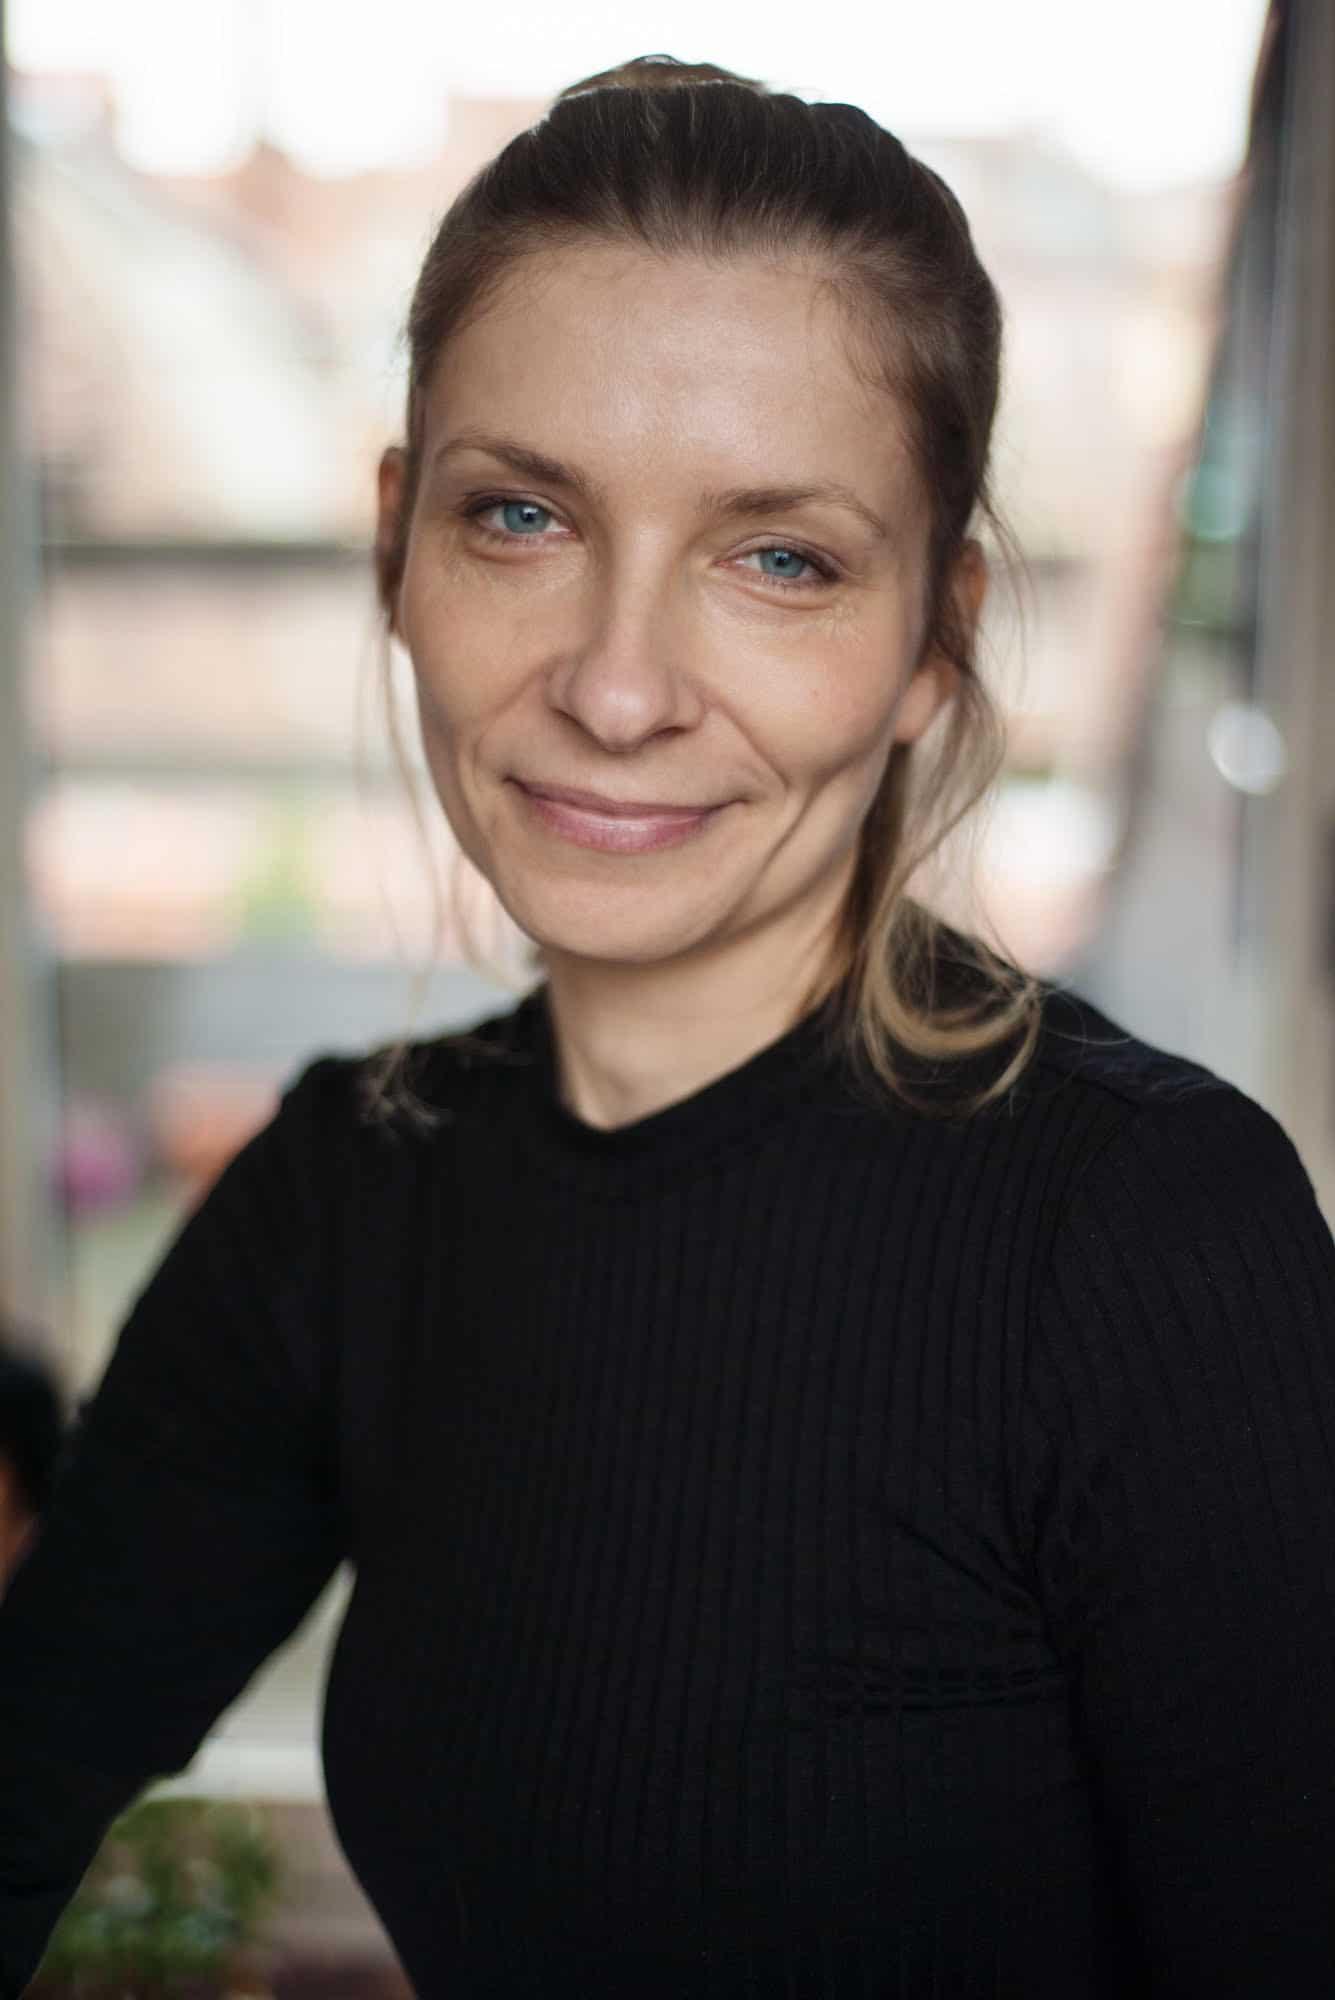 The PEN Ten: An Interview with Aleksandra Lun, translated by Elizabeth Bryer